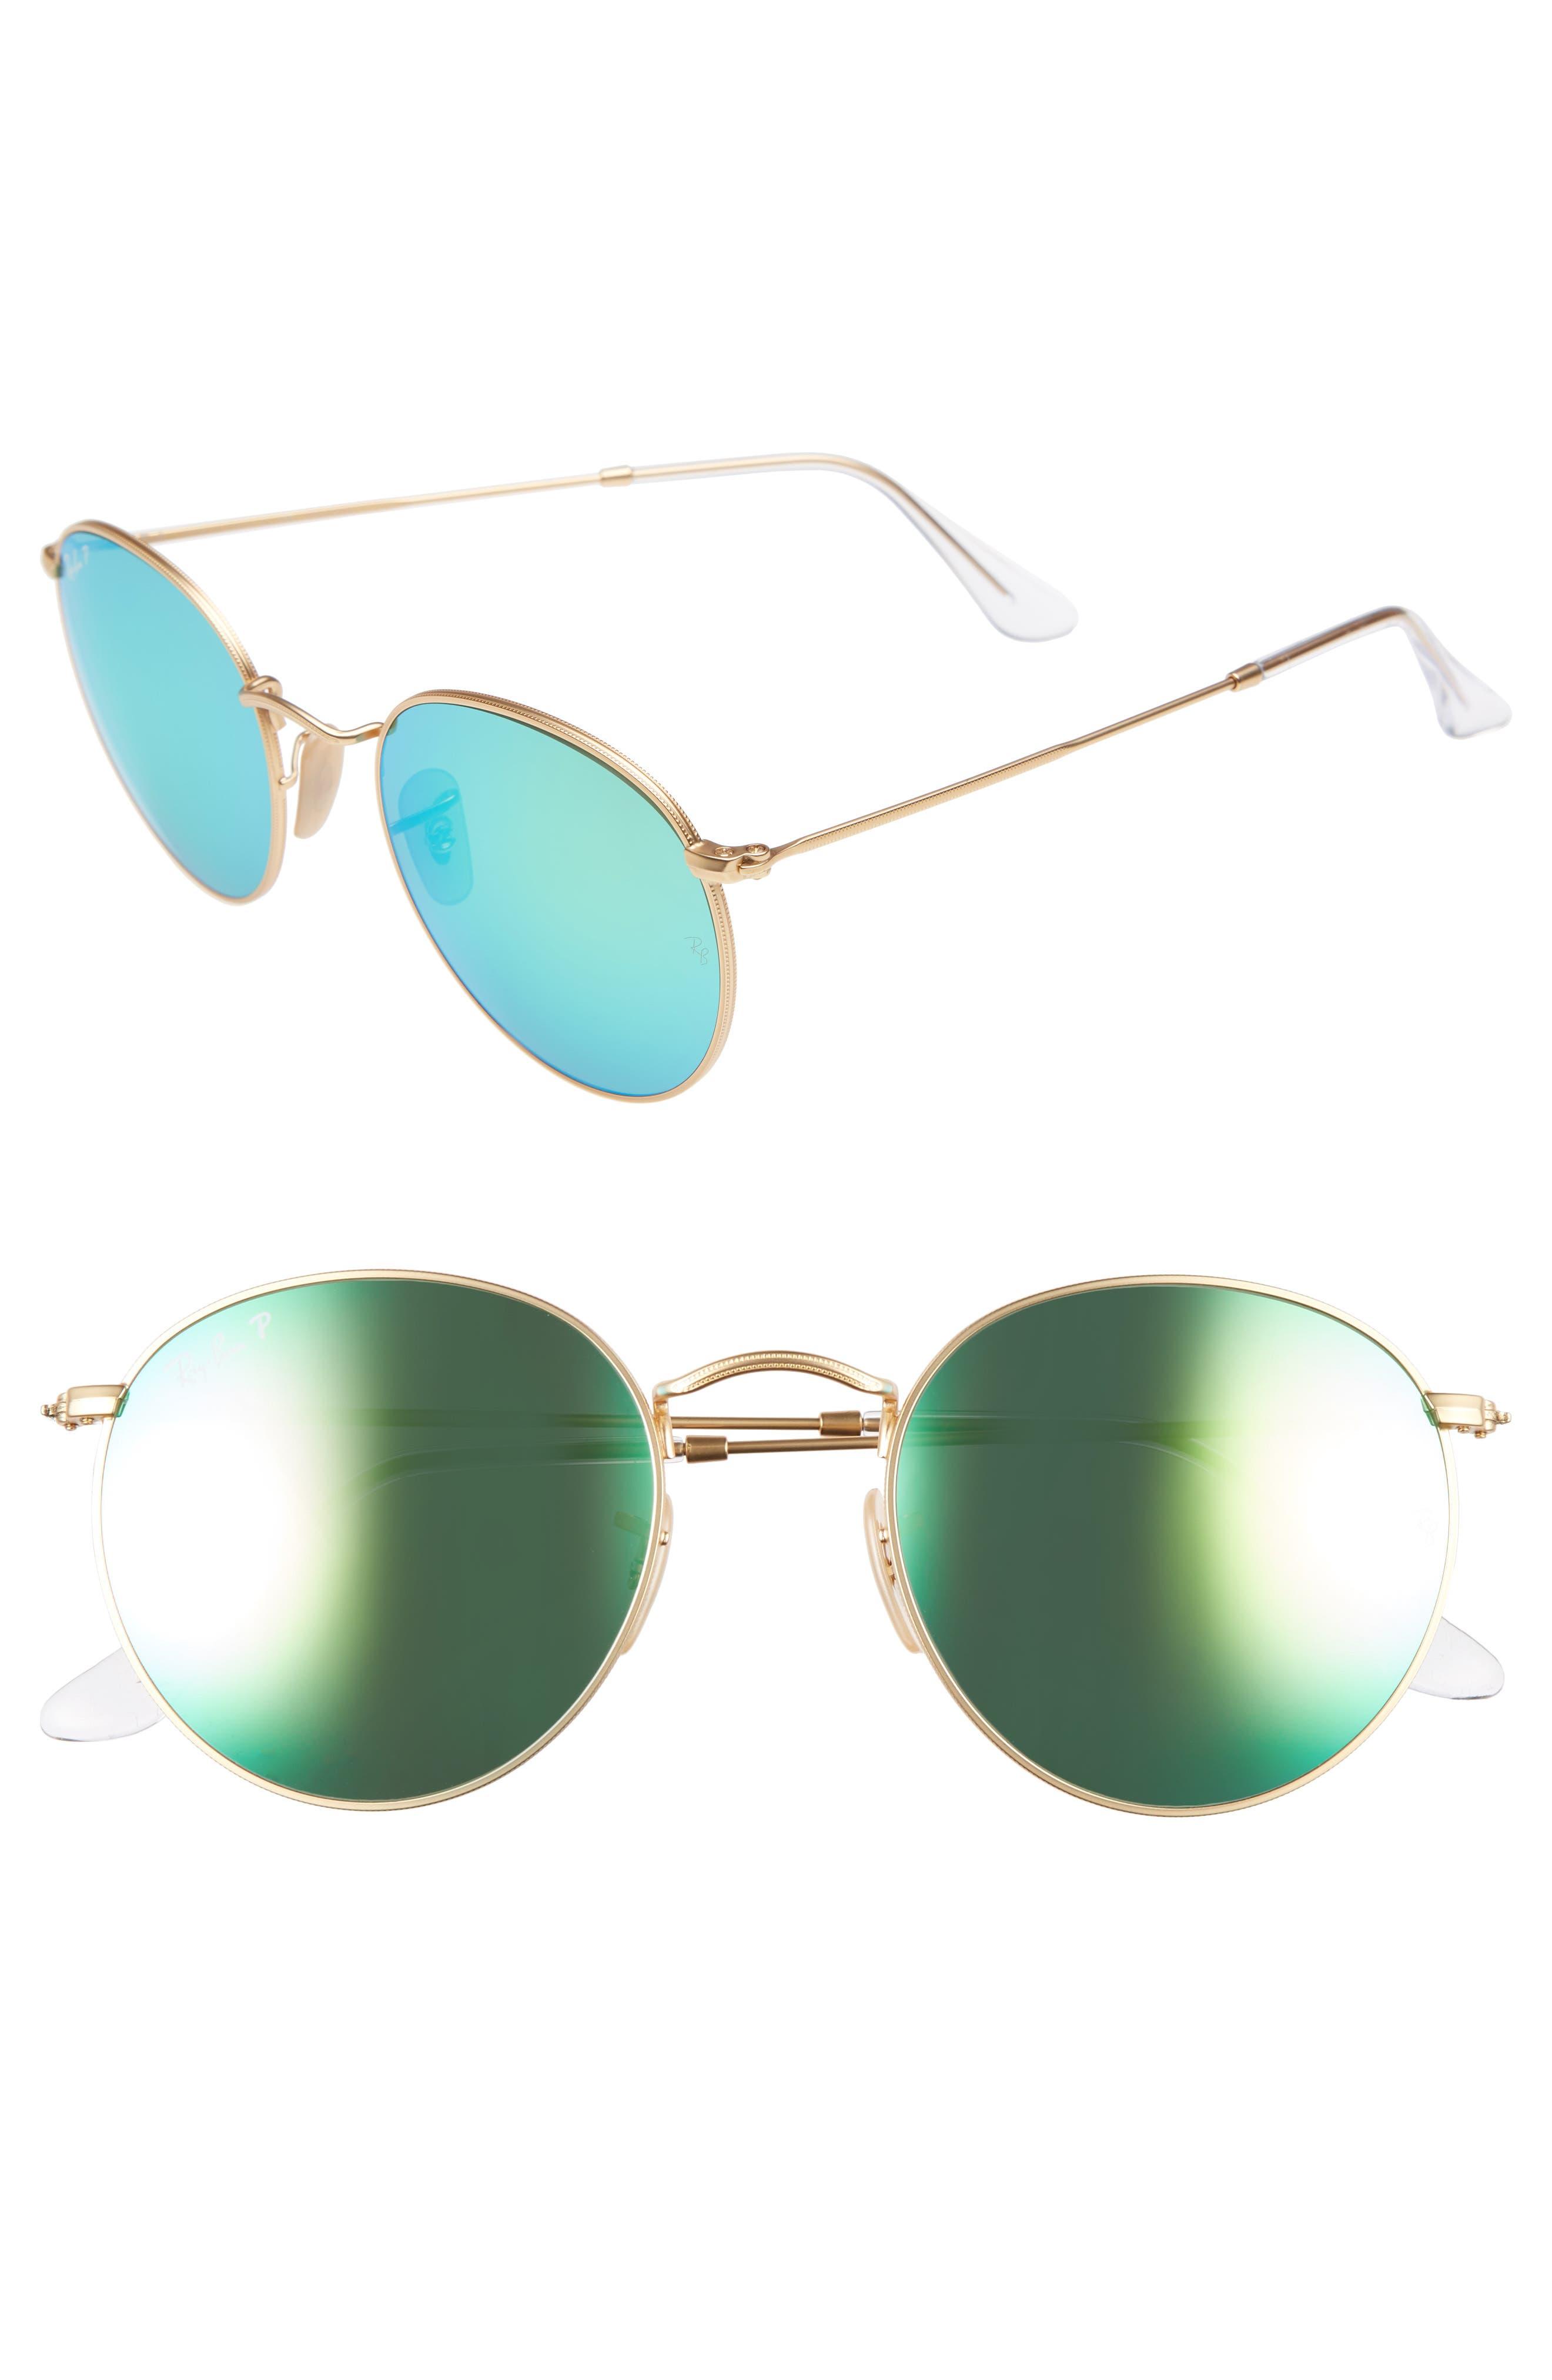 53mm Polarized Round Retro Sunglasses,                             Main thumbnail 1, color,                             300